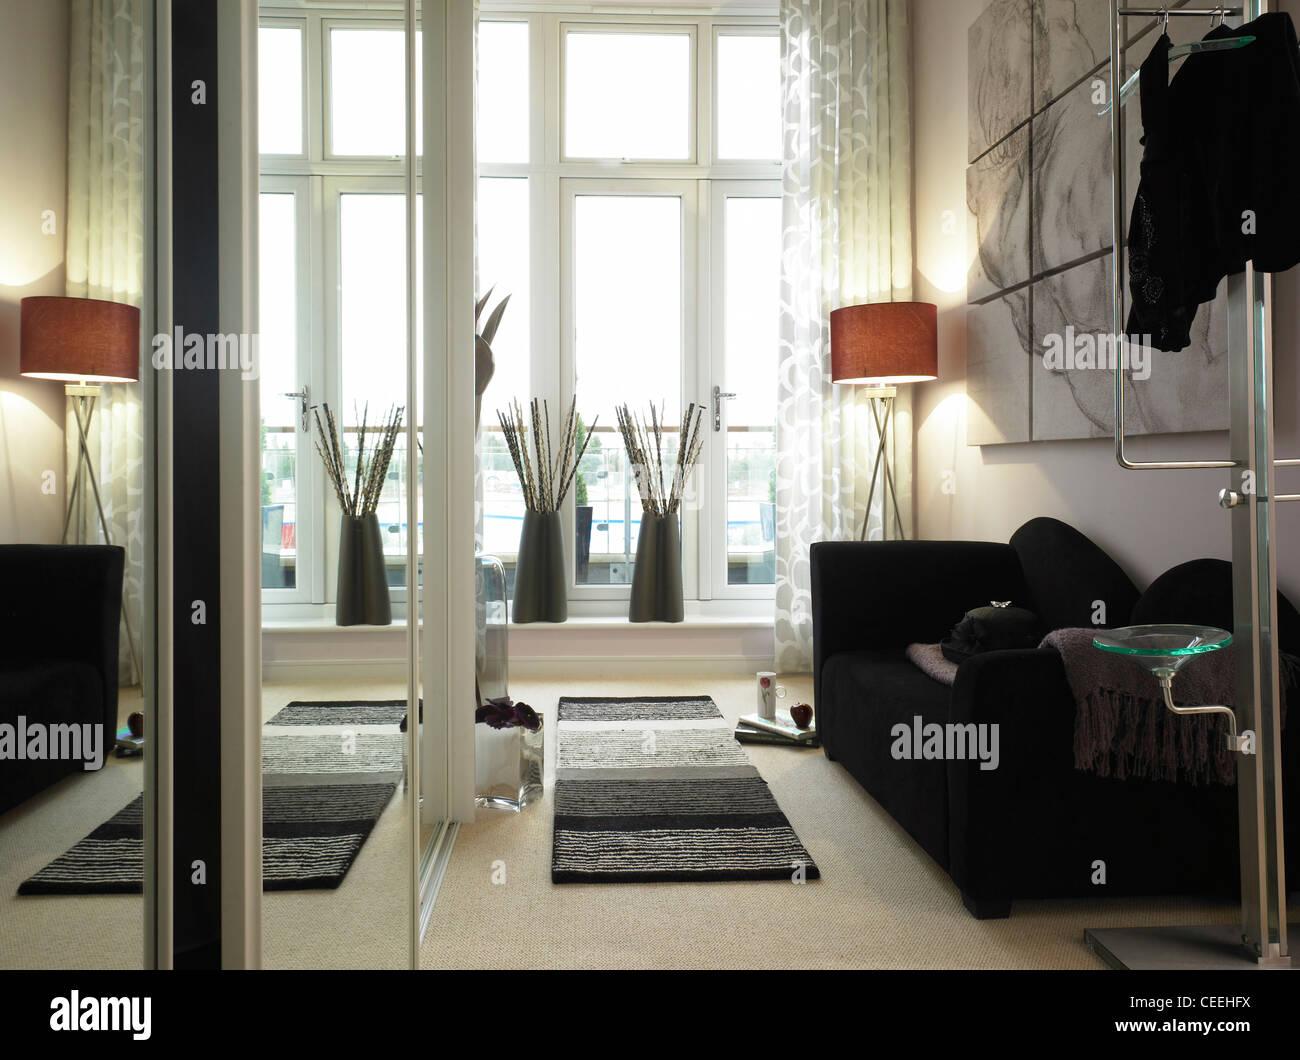 Interior view of bedroom area - Stock Image